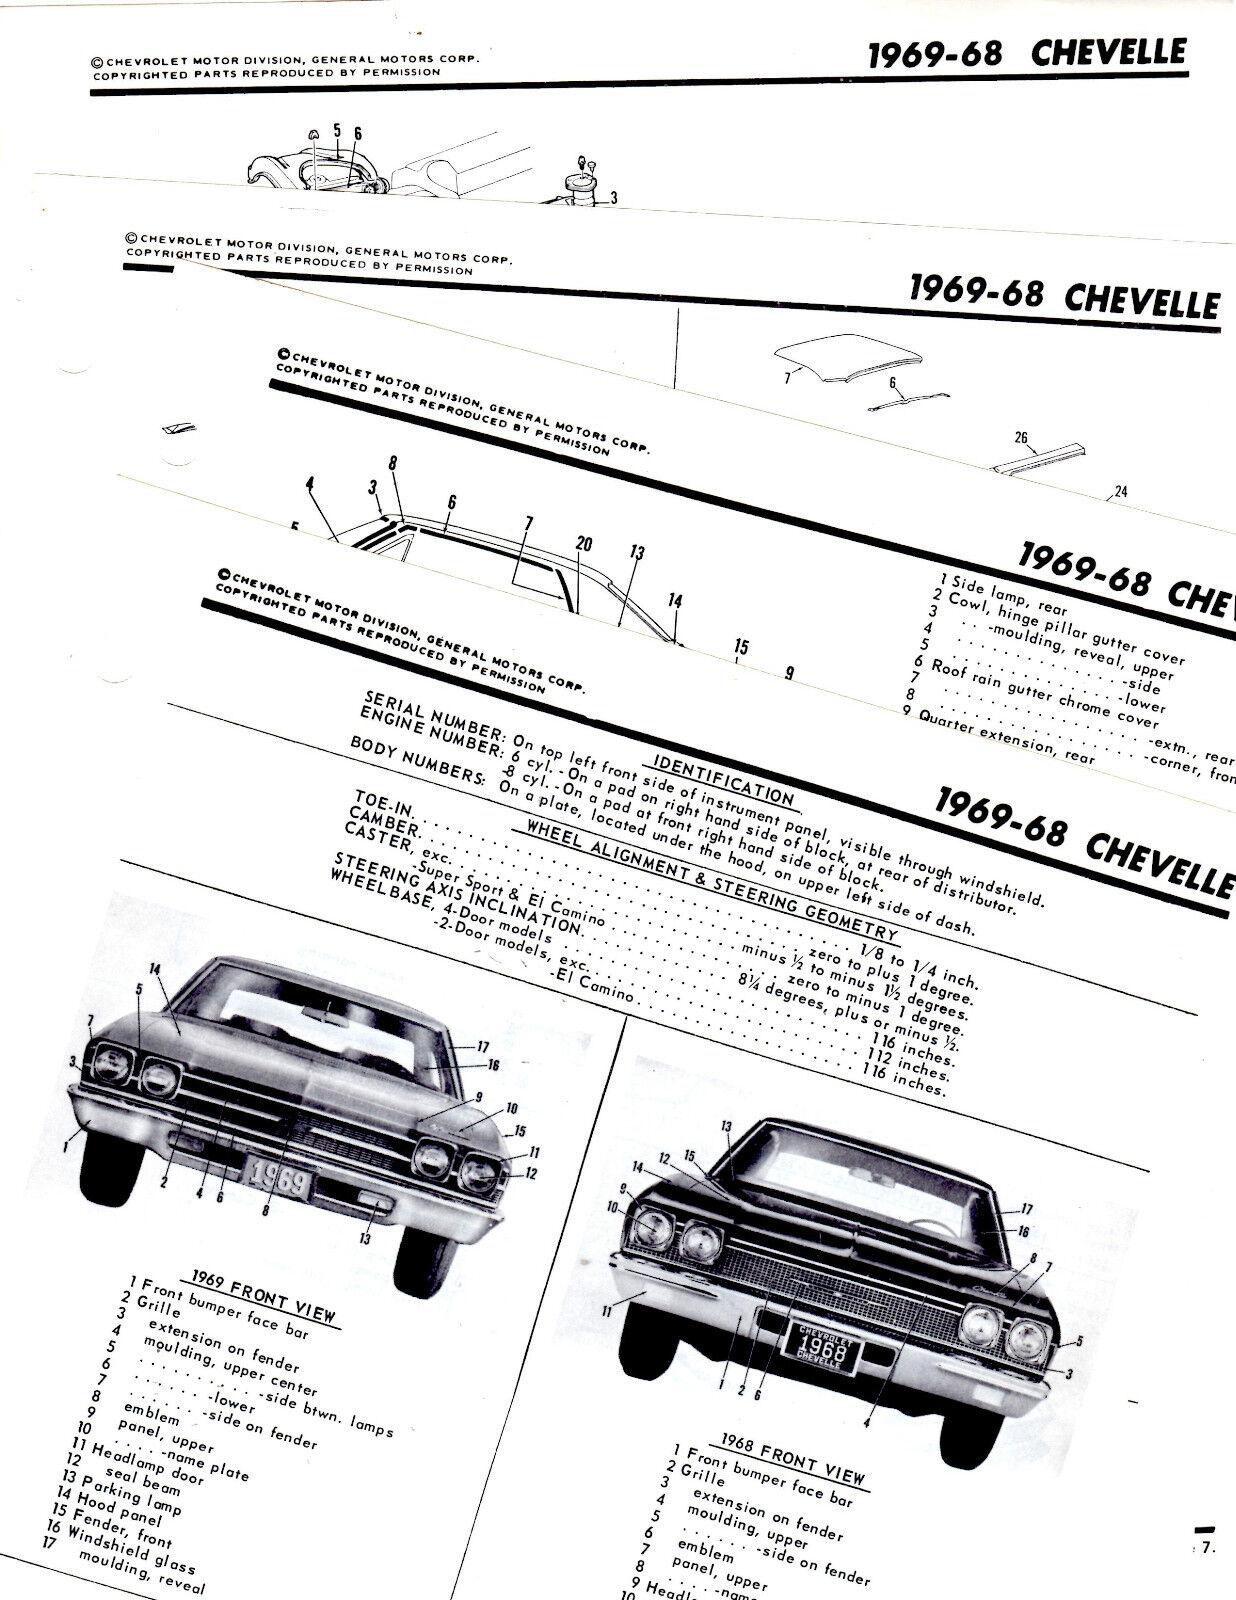 1968 1969 CHEVROLET CHEVELLE MALIBU PARTS FRAME MOTOR'S